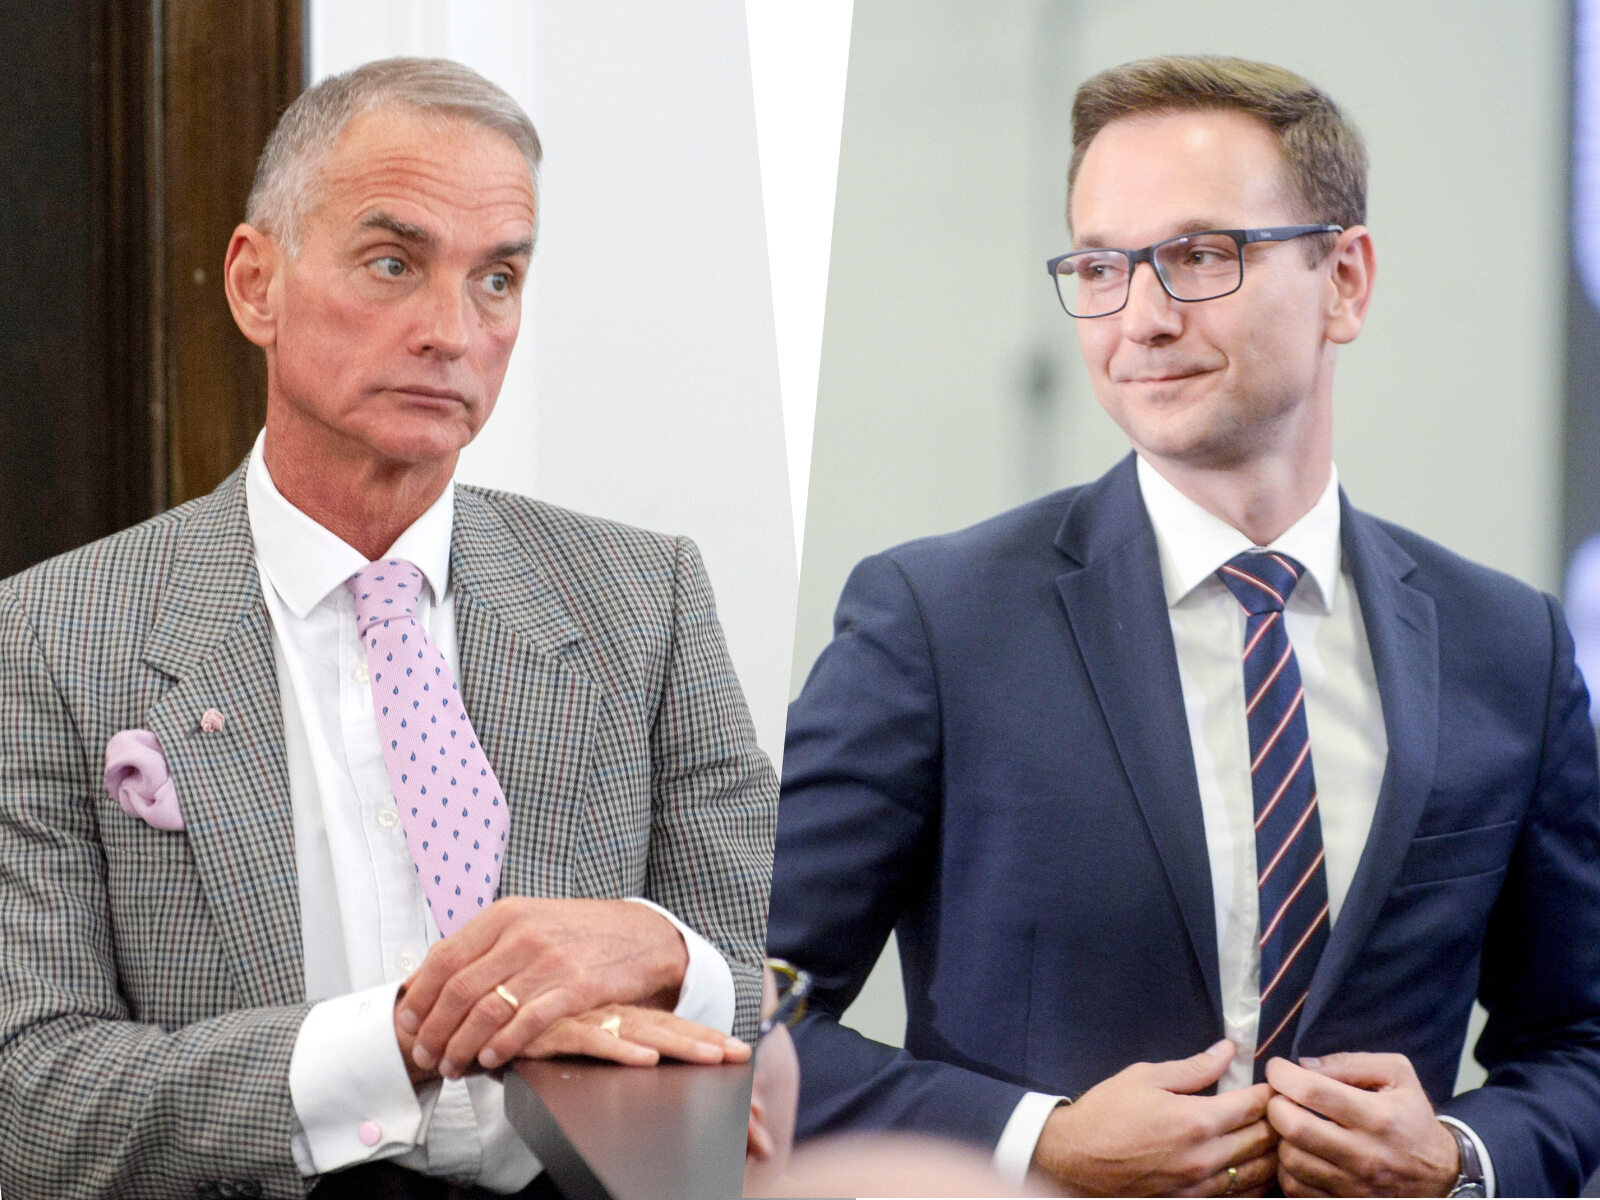 Jan Maria Jackowski, Waldemar Buda